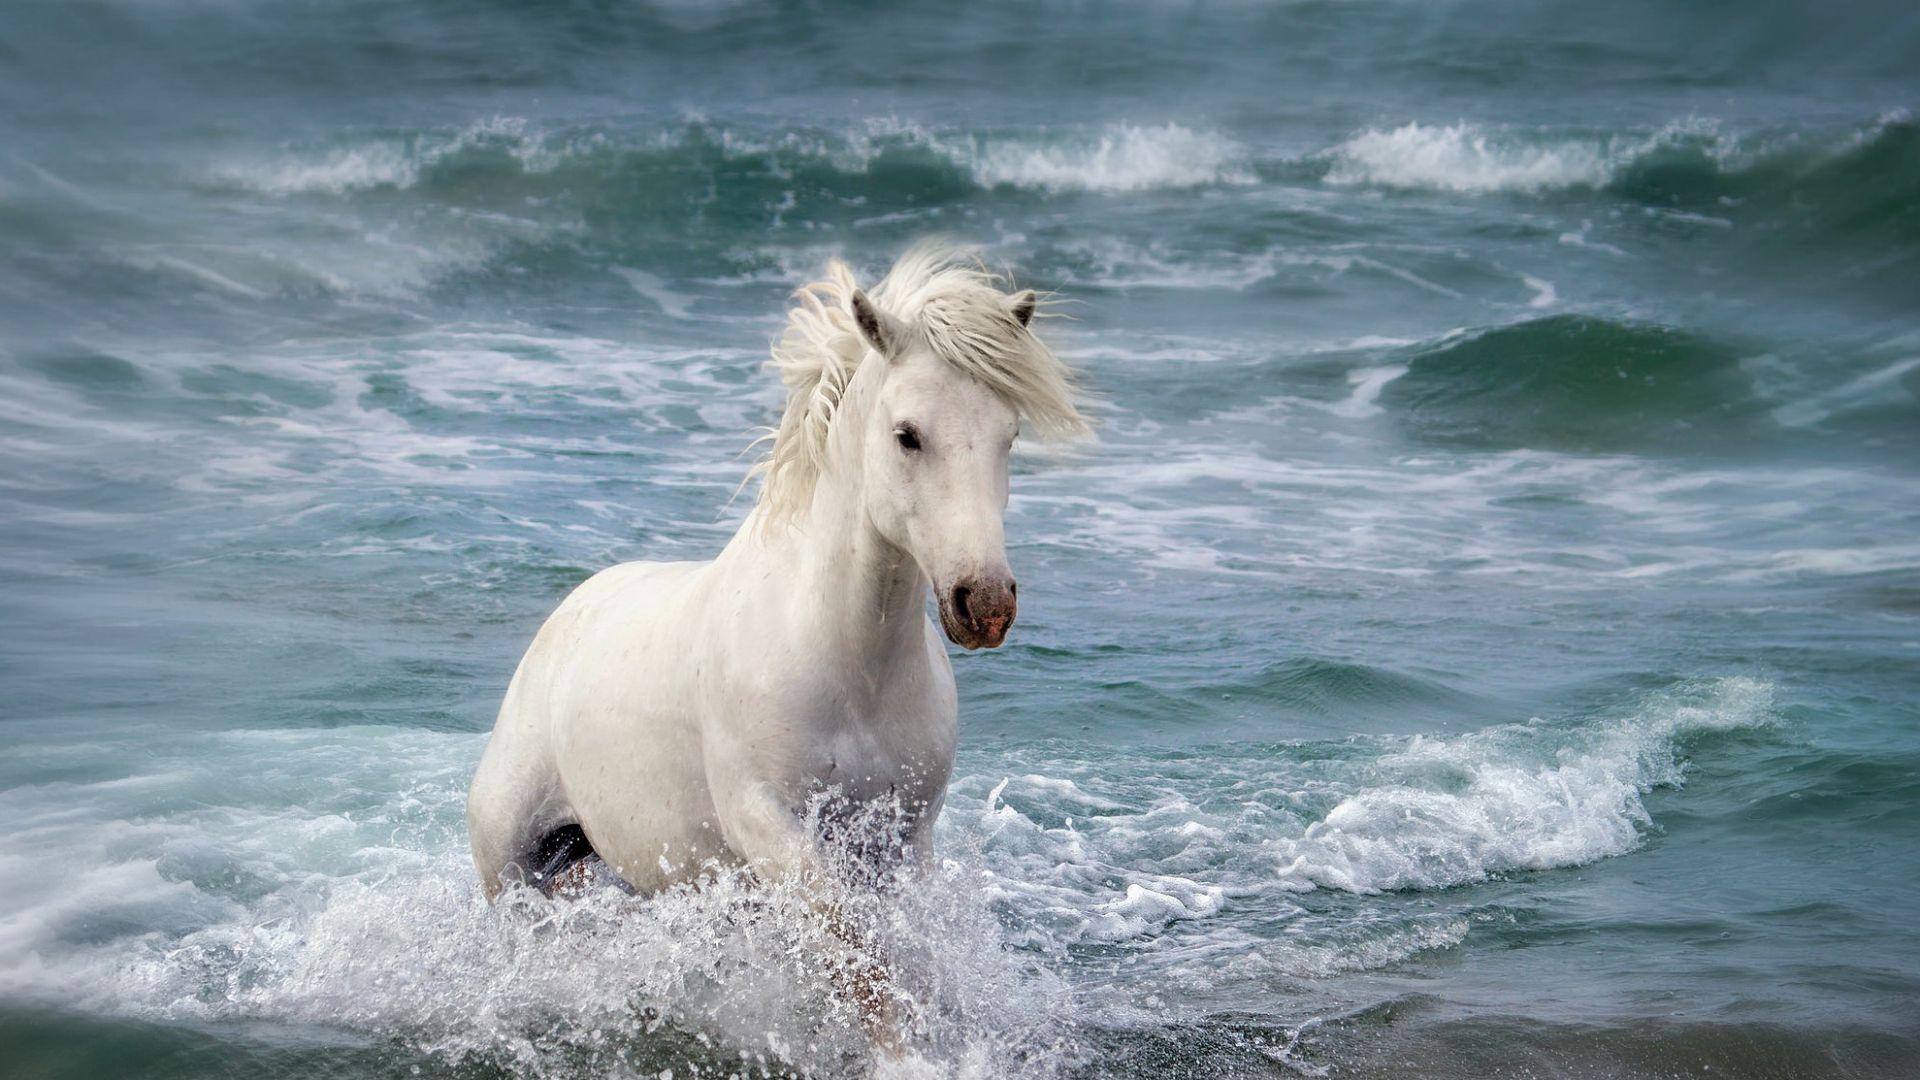 Wallpaper White horse running at beach